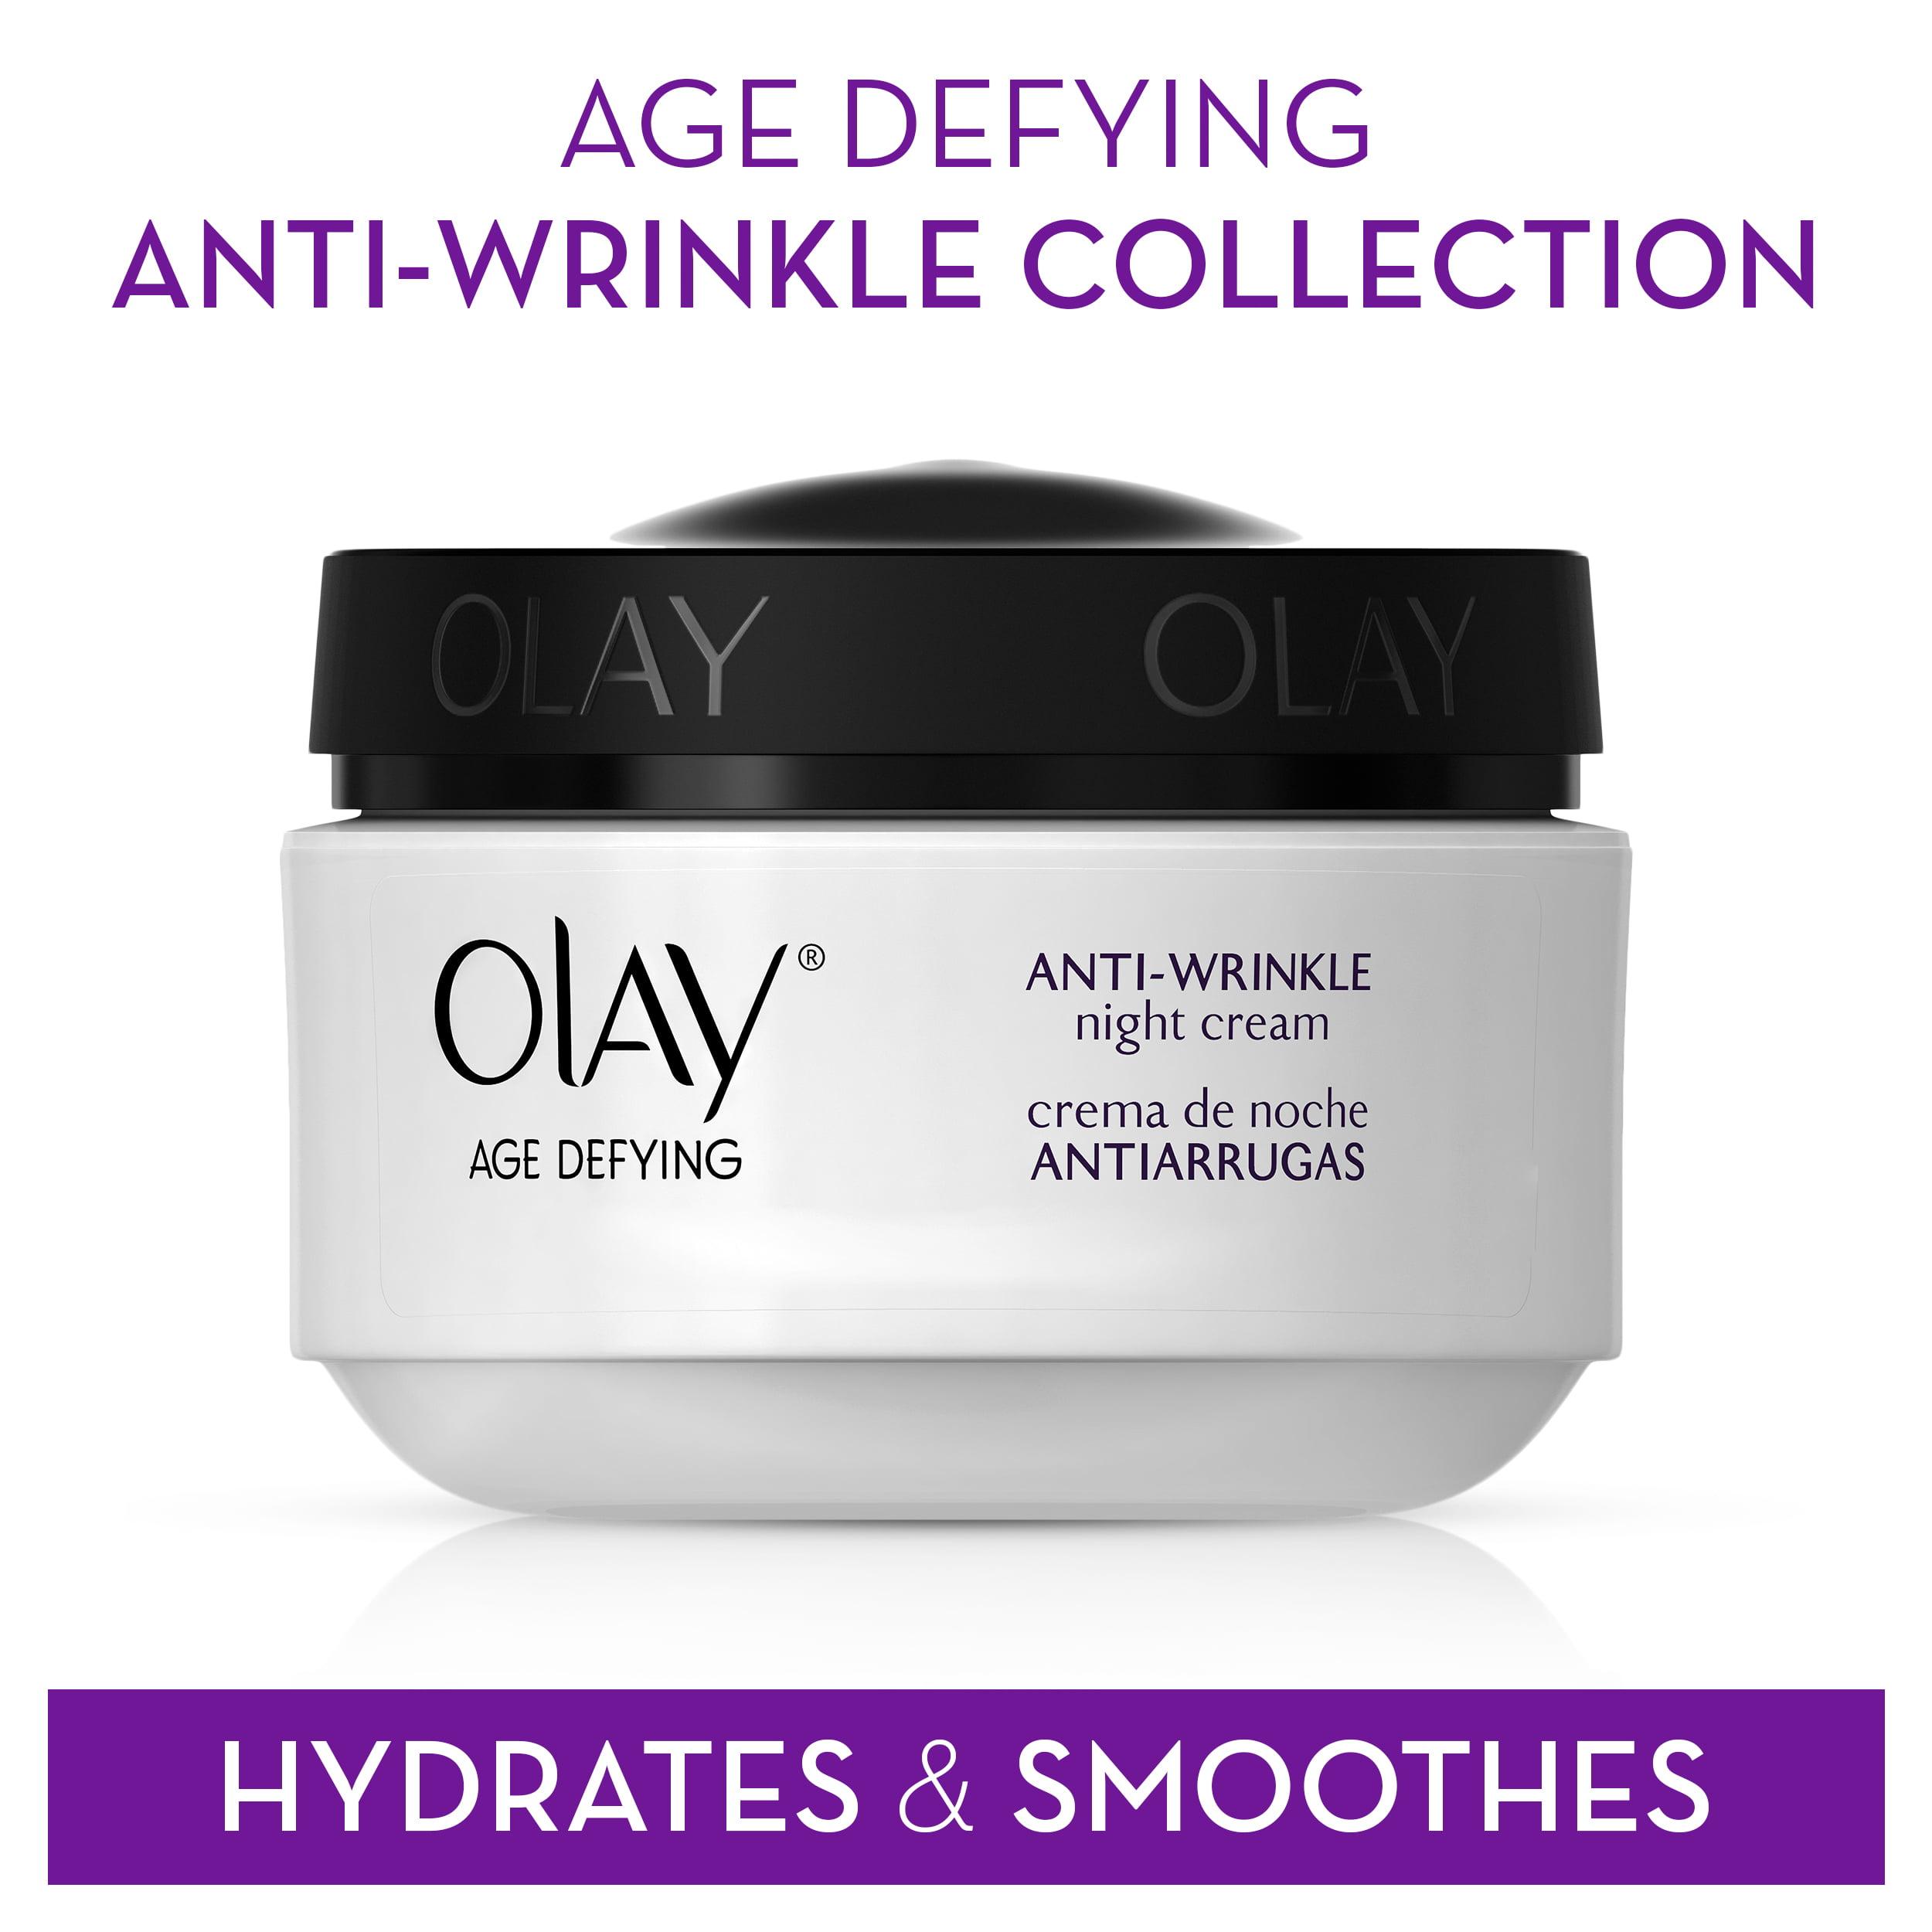 Olay Age Defying Anti Wrinkle Night Cream 2 0 Oz Walmart Com Walmart Com